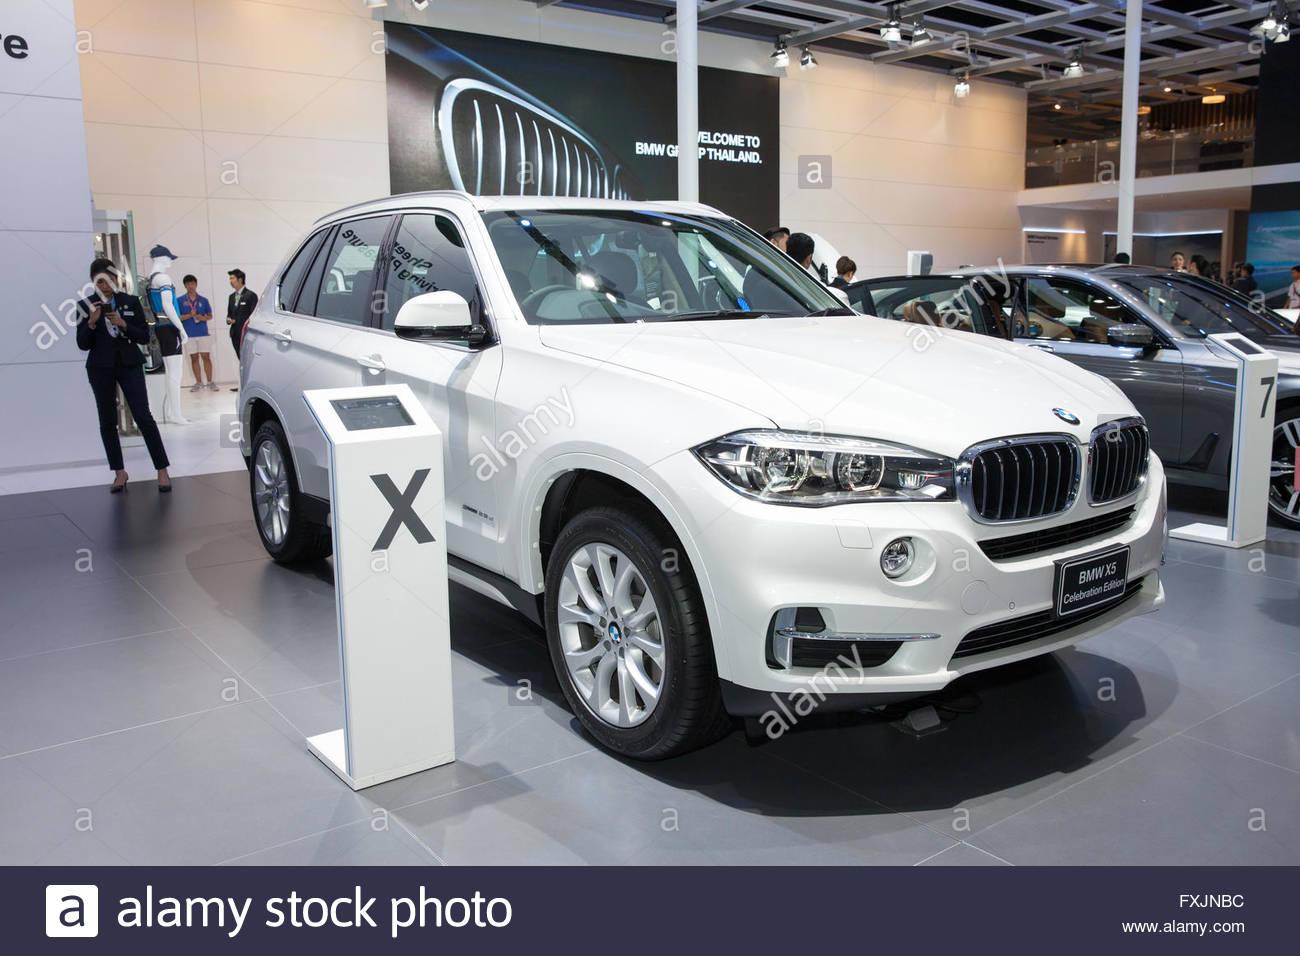 BANGKOK - MARCH 22: BMW X5 Celebration Edition car on display at The 37 th Thailand Bangkok International  Motor - Stock Image